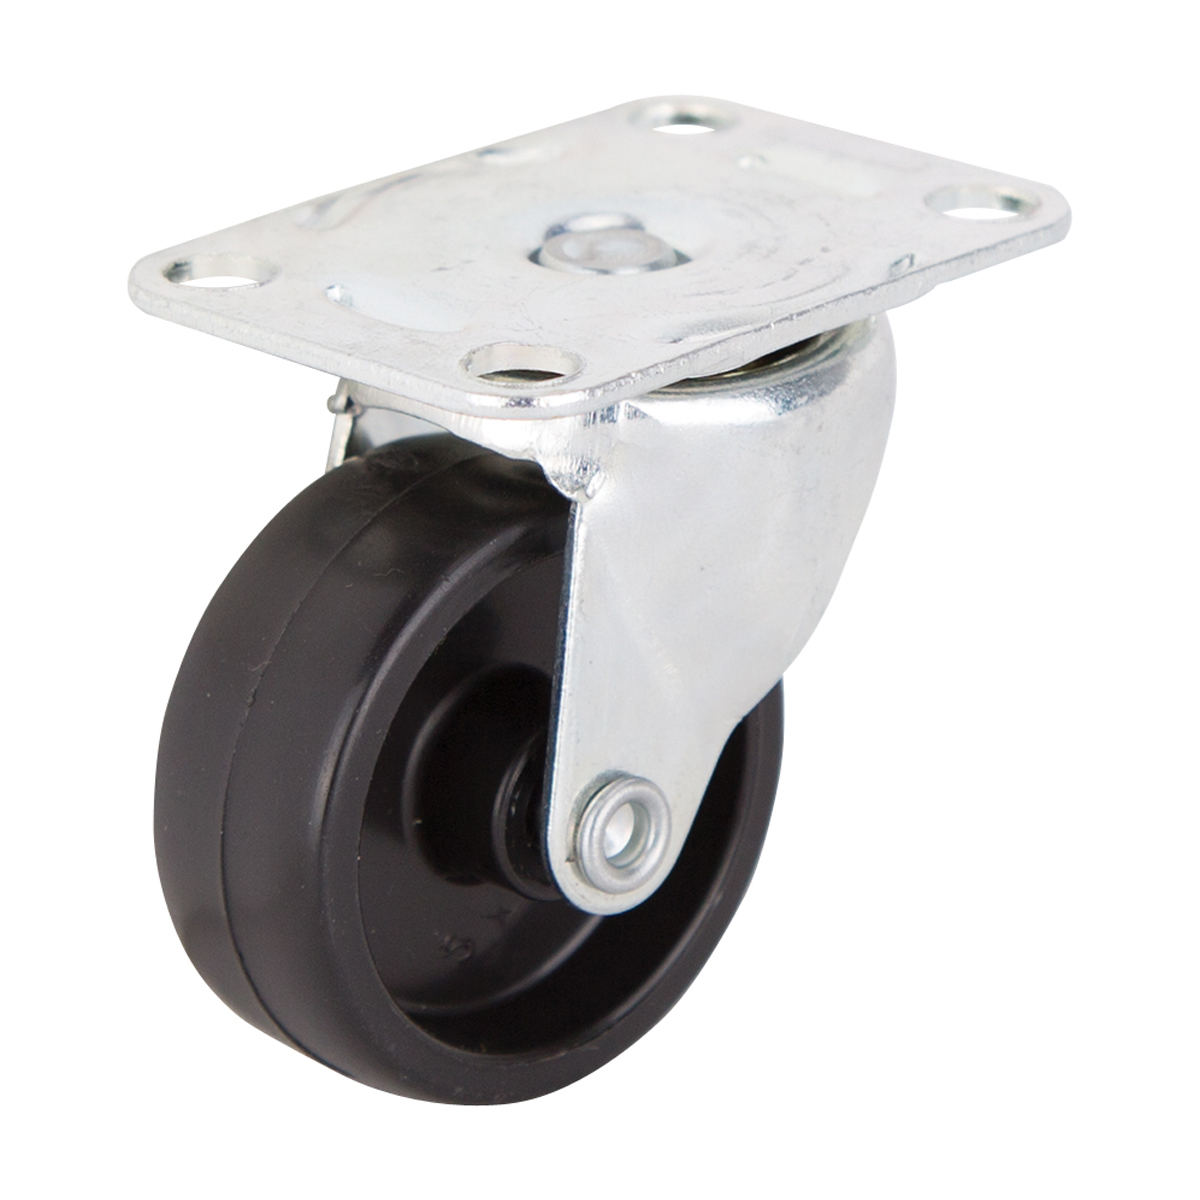 Picture of ProSource JC-B09-PS Swivel Caster, 1-5/8 in Dia Wheel, Hard Plastic Wheel, Black, 40 lb